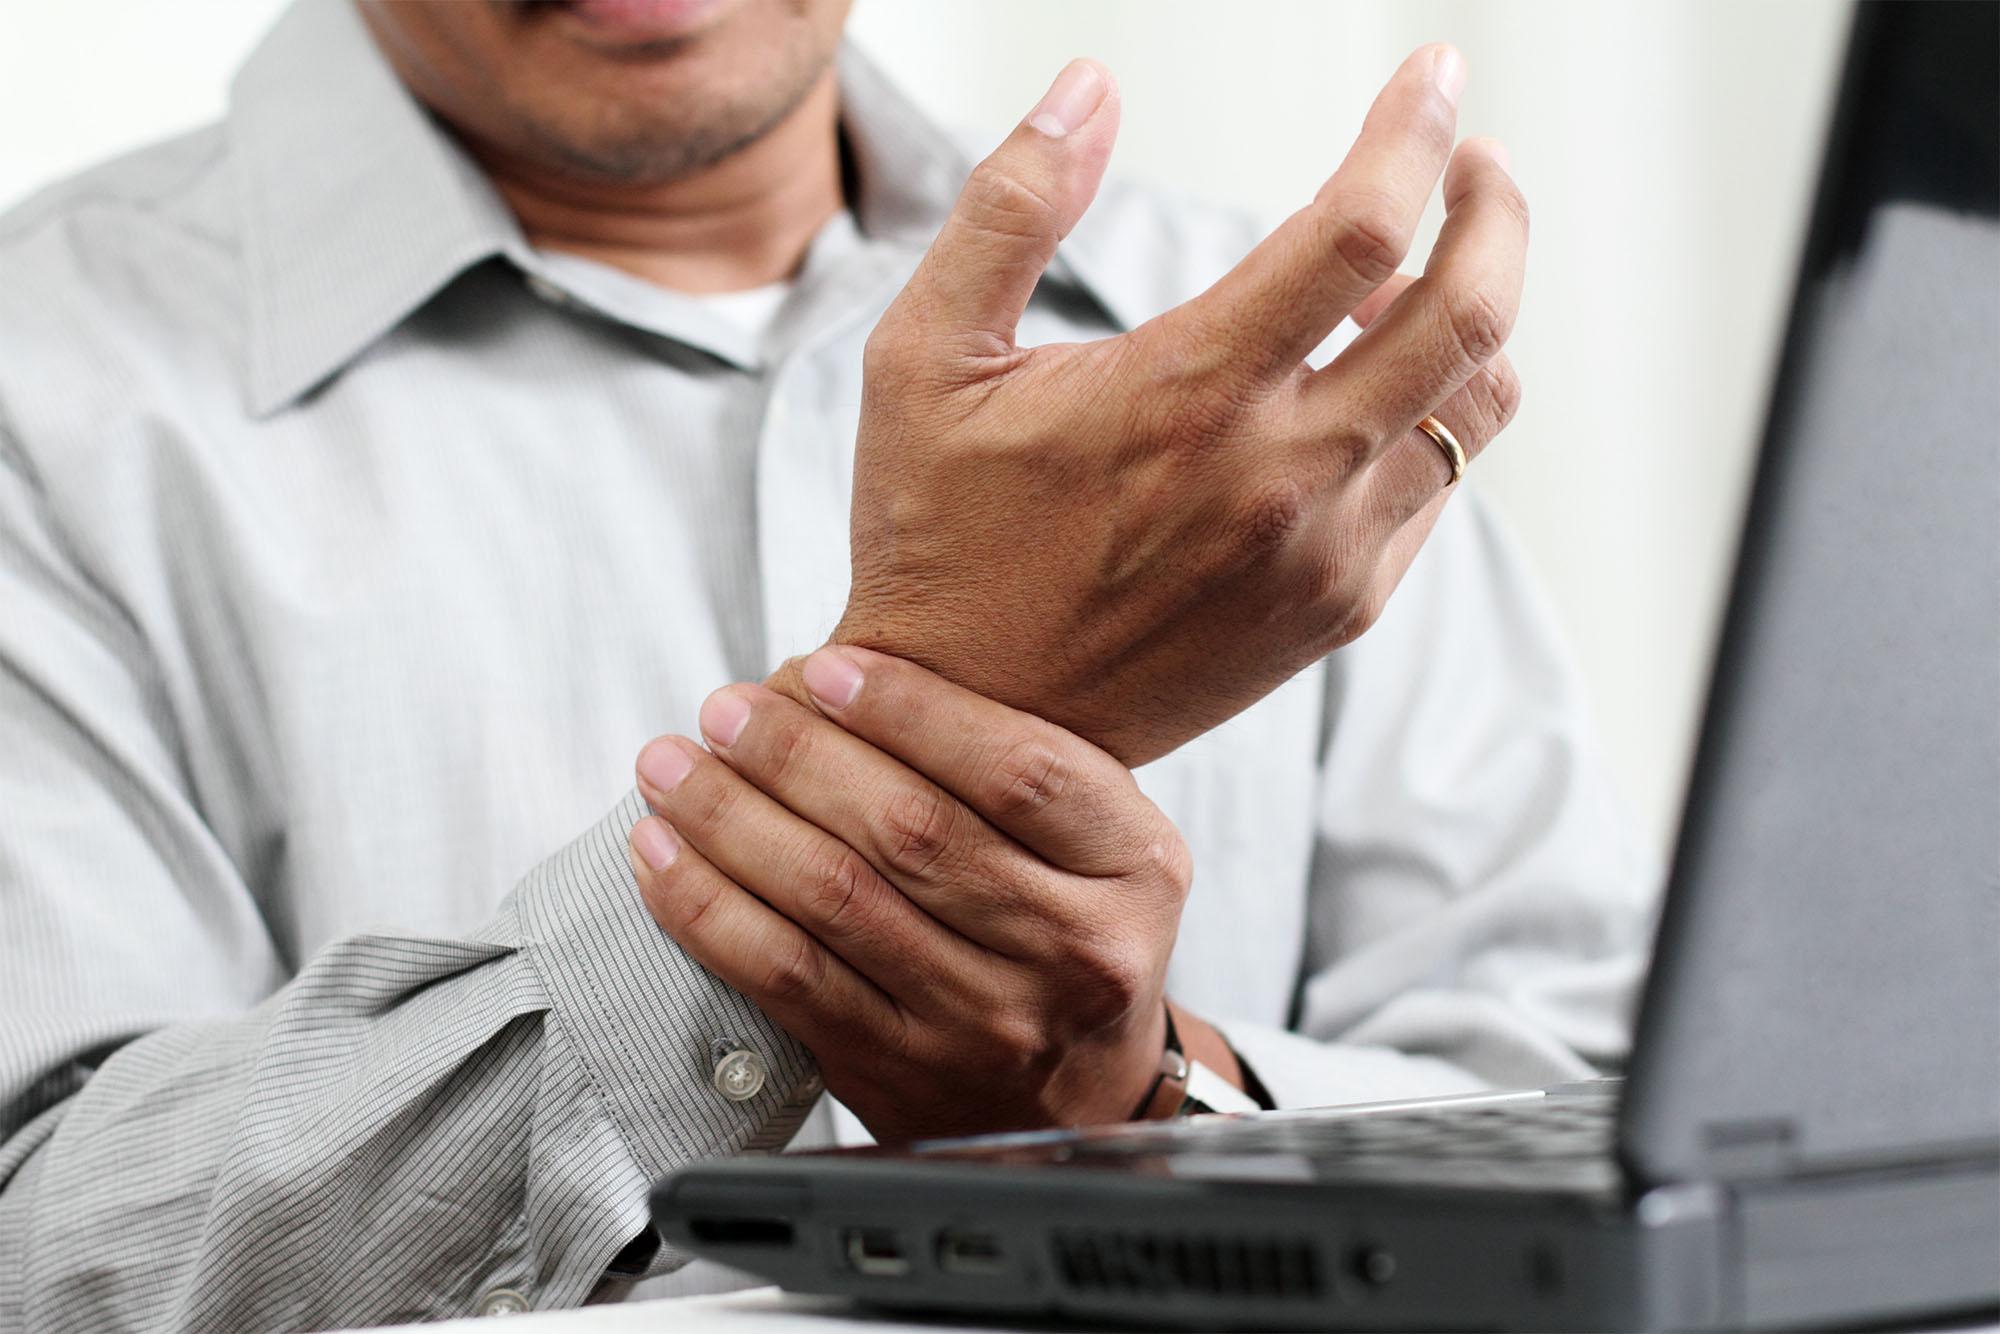 Difference Between Rheumatoid Arthritis and Fibromyalgia